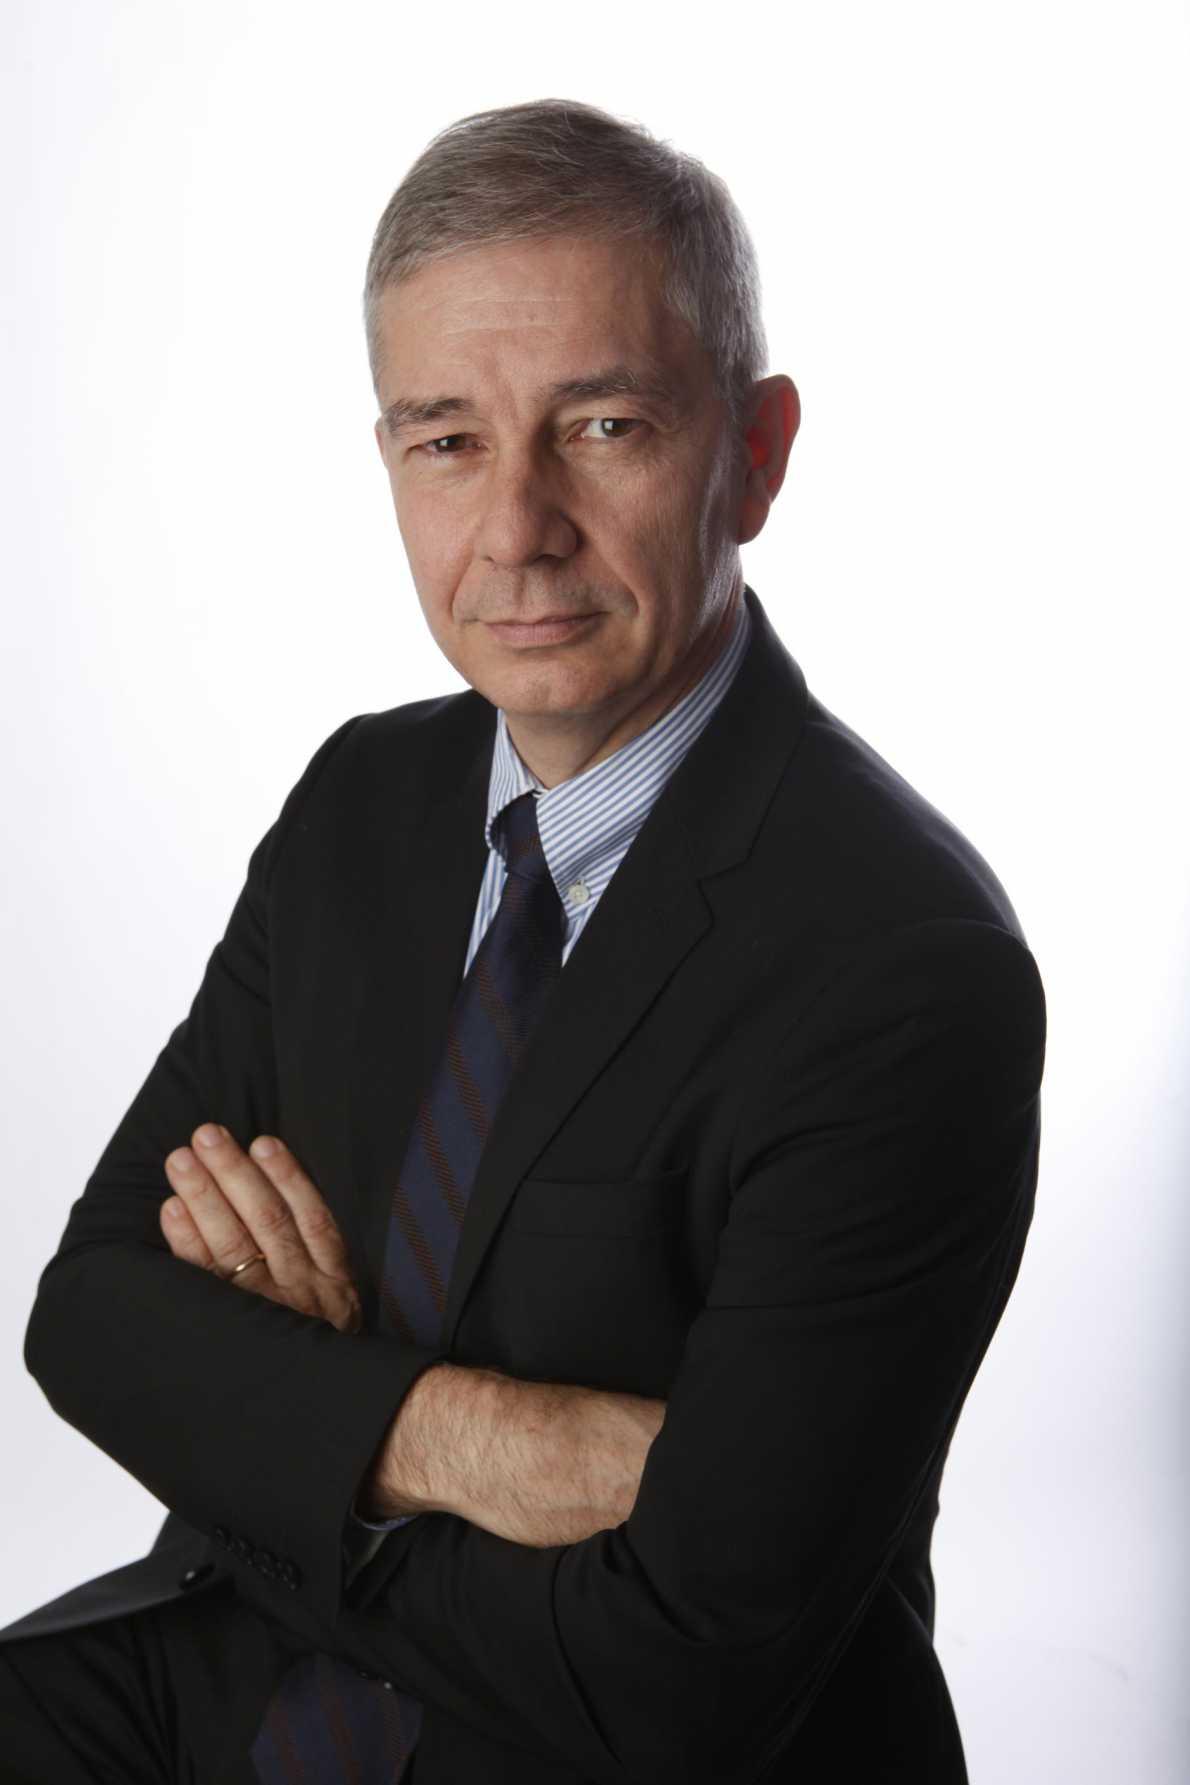 Portrait F.Laporte President and CEO (©annealsys.com 2016)